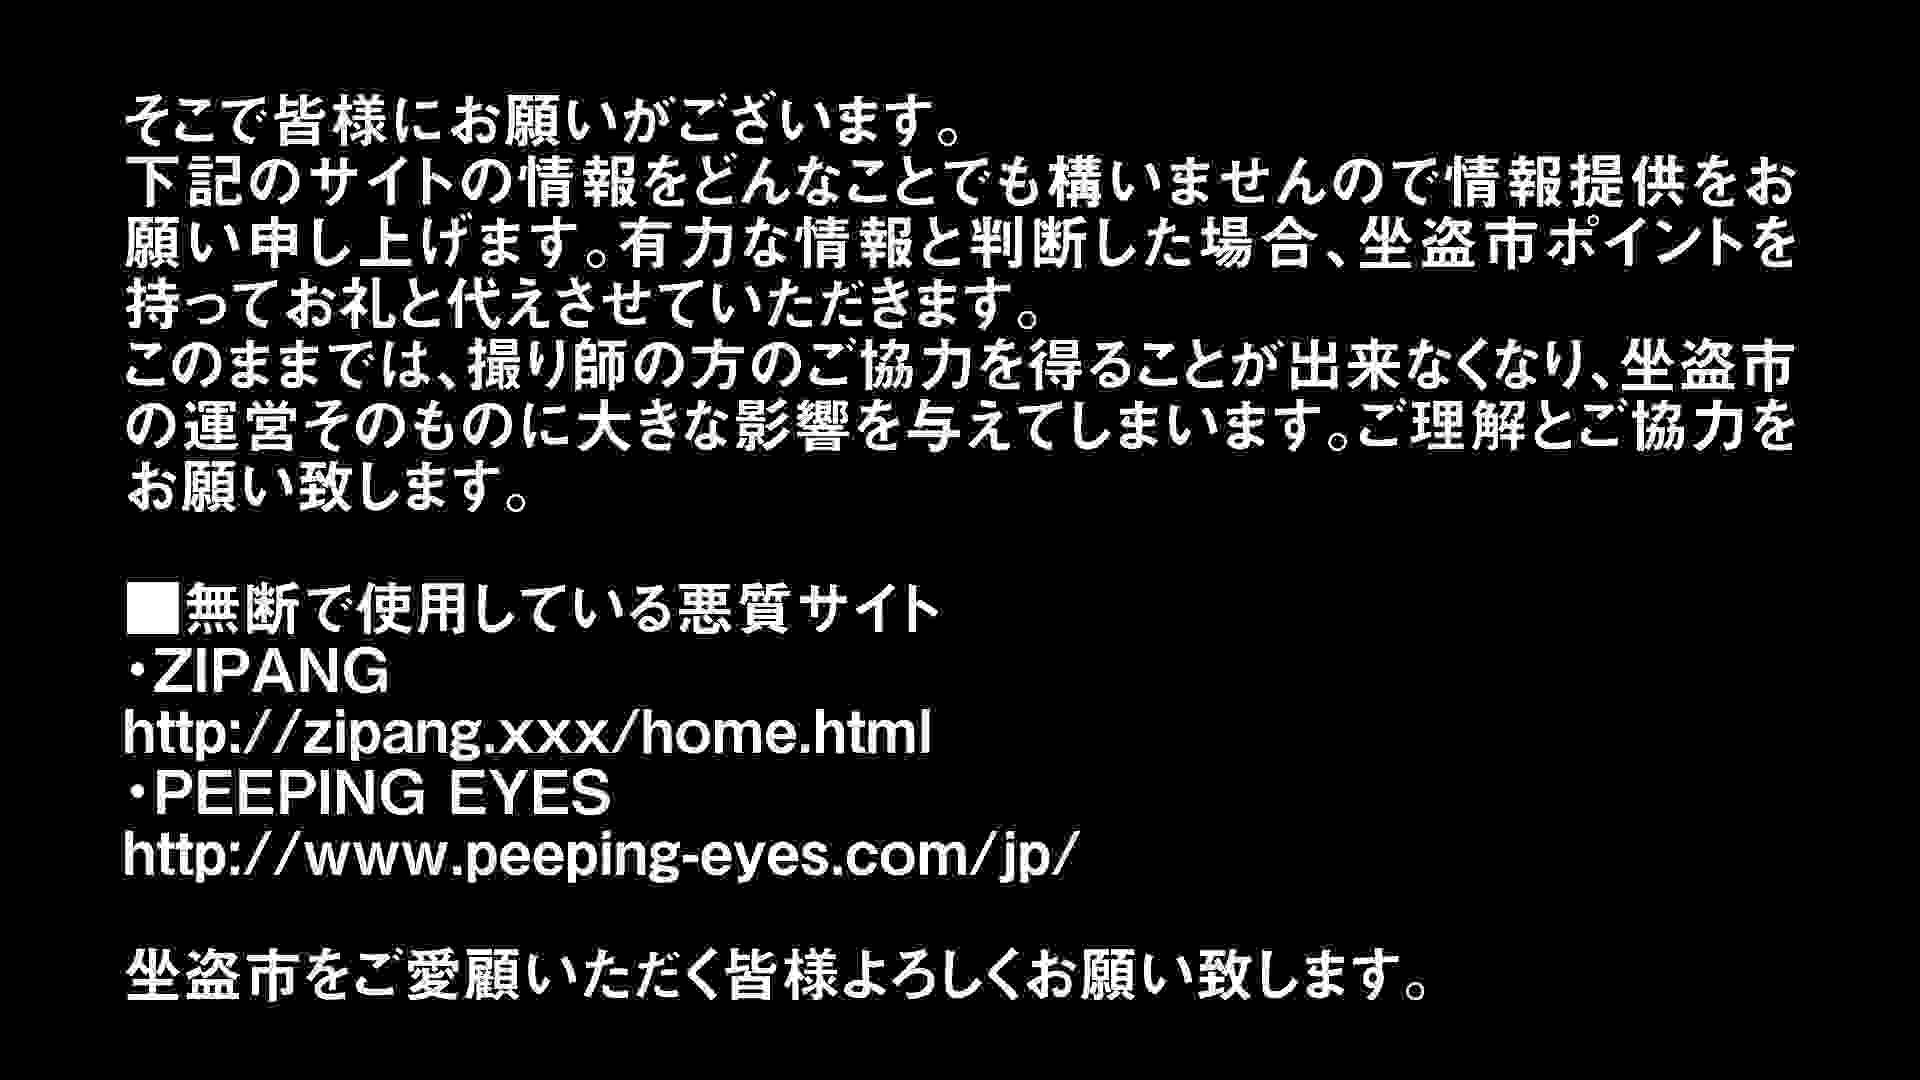 Aquaな露天風呂Vol.302 盗撮師作品  82pic 21